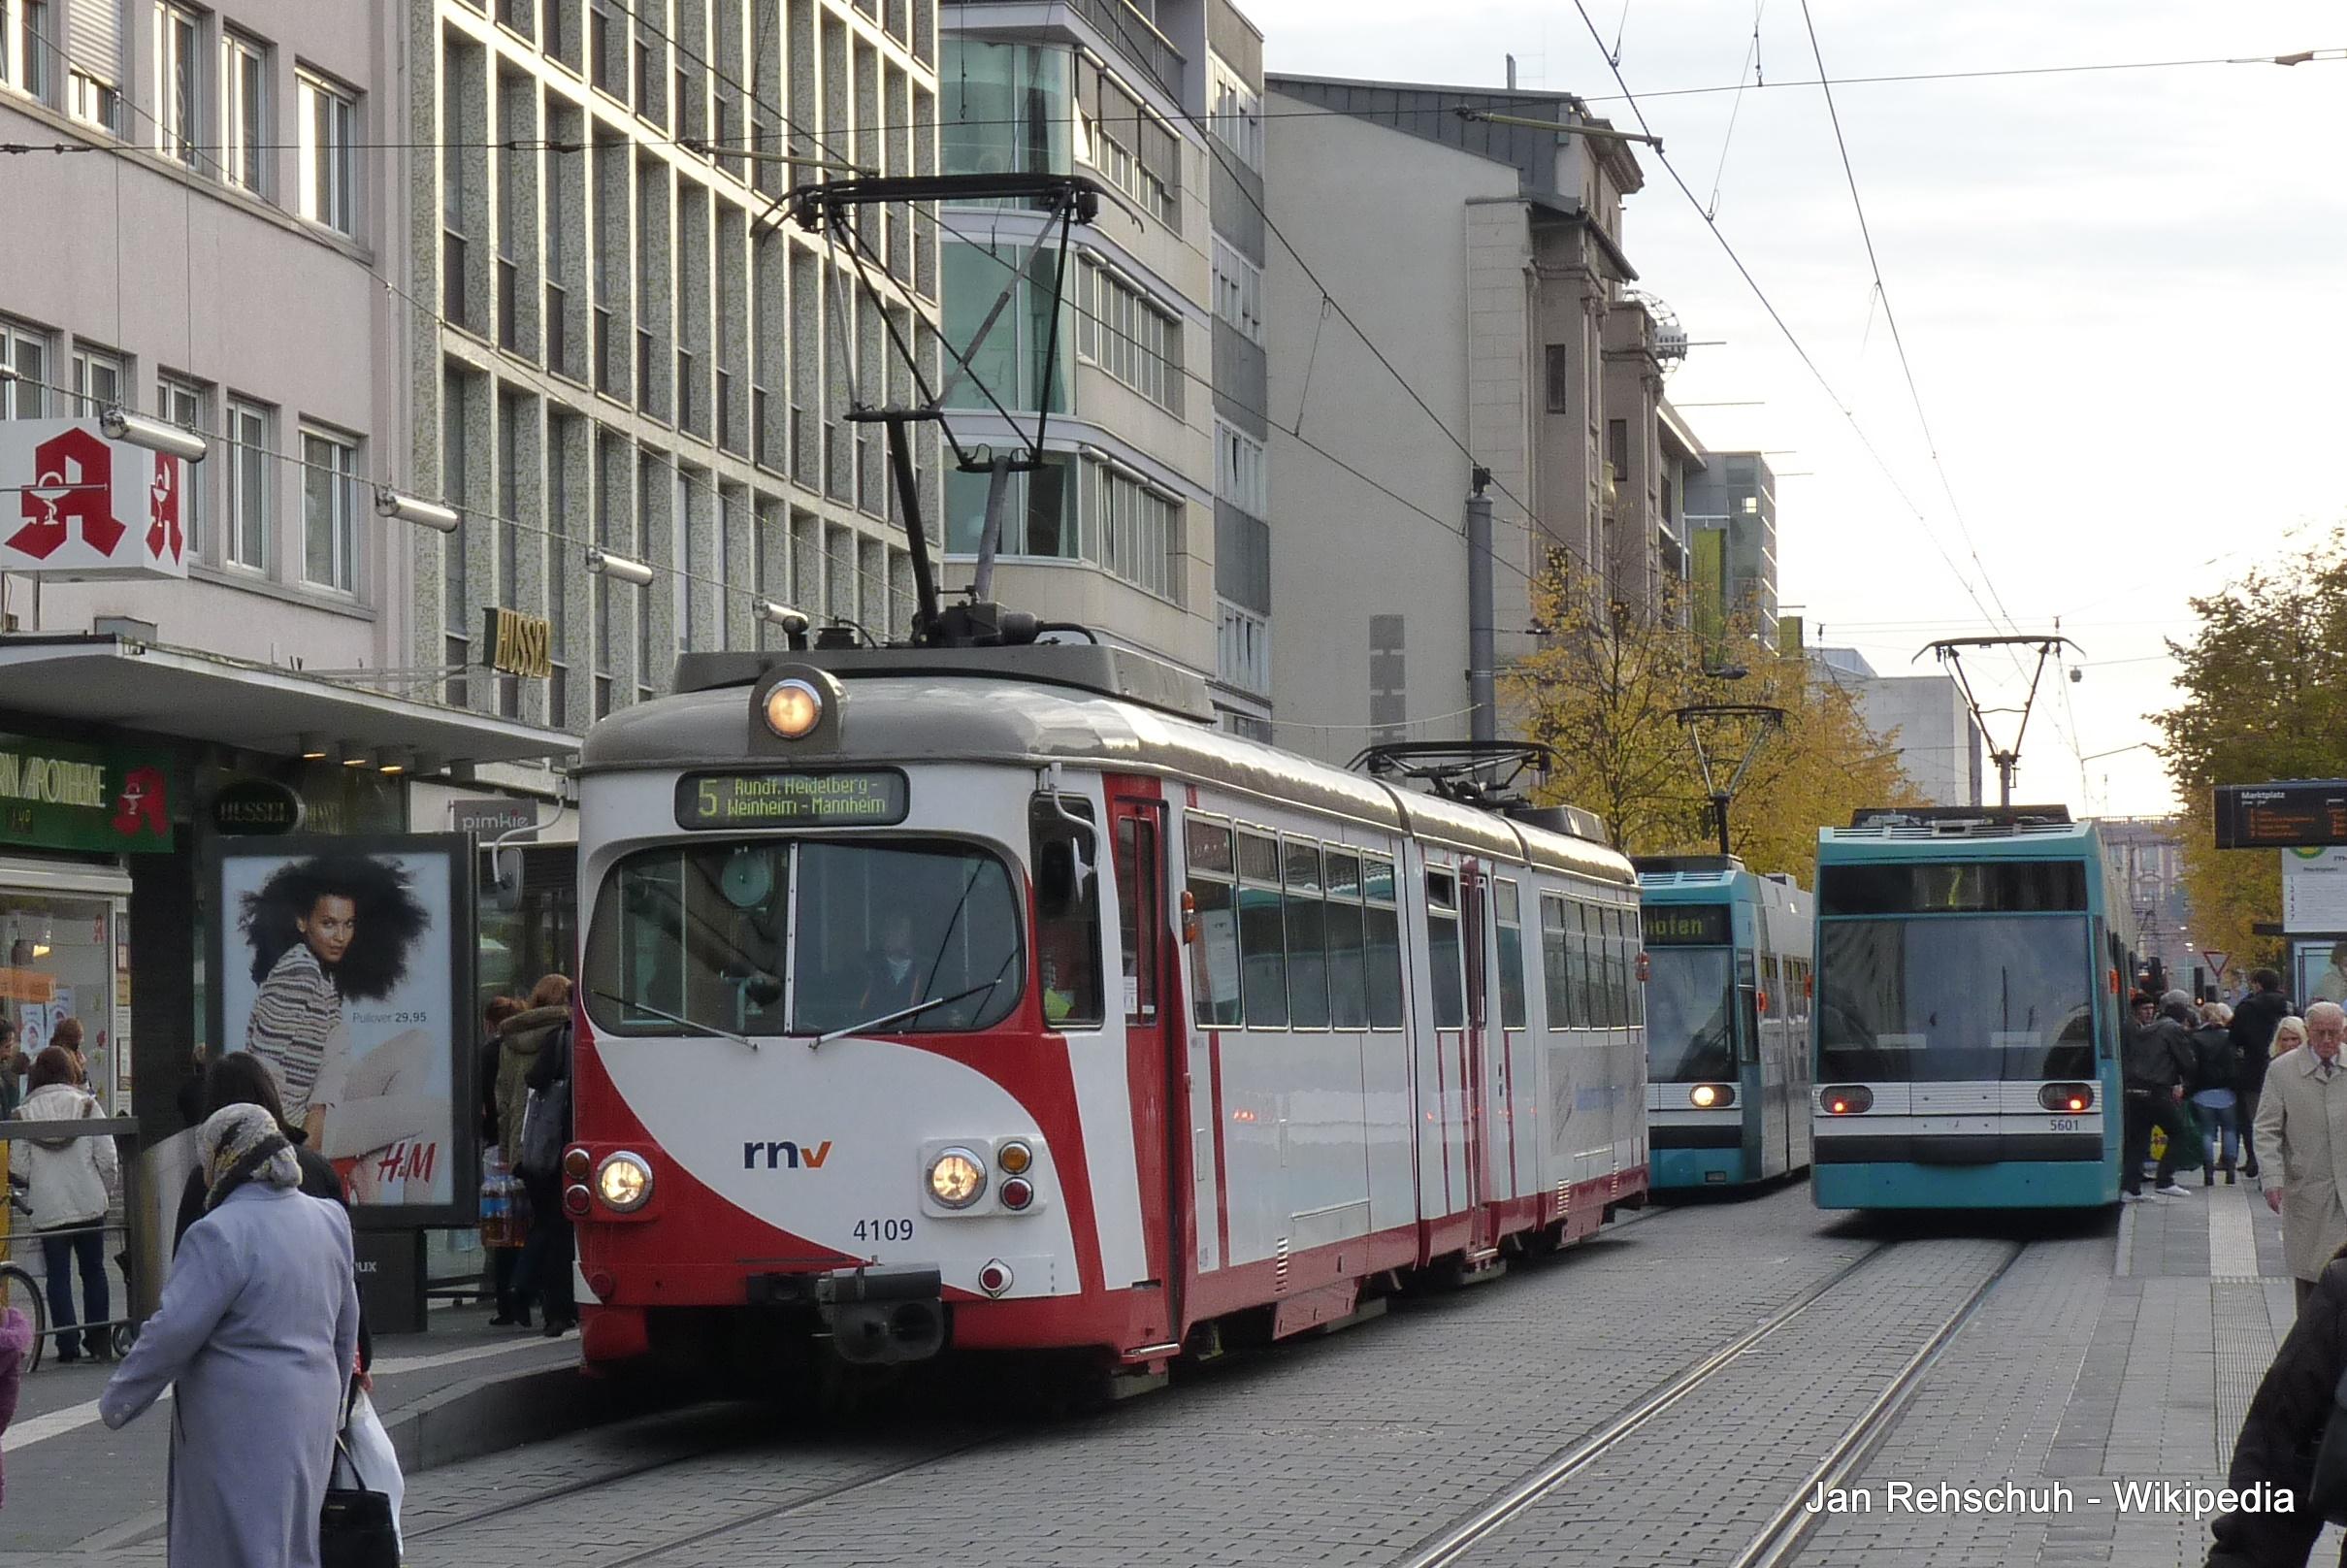 Streetcar Straßenbahn Tram Mannheim RNV Rhein-Neckar-Verbund 17.JPG